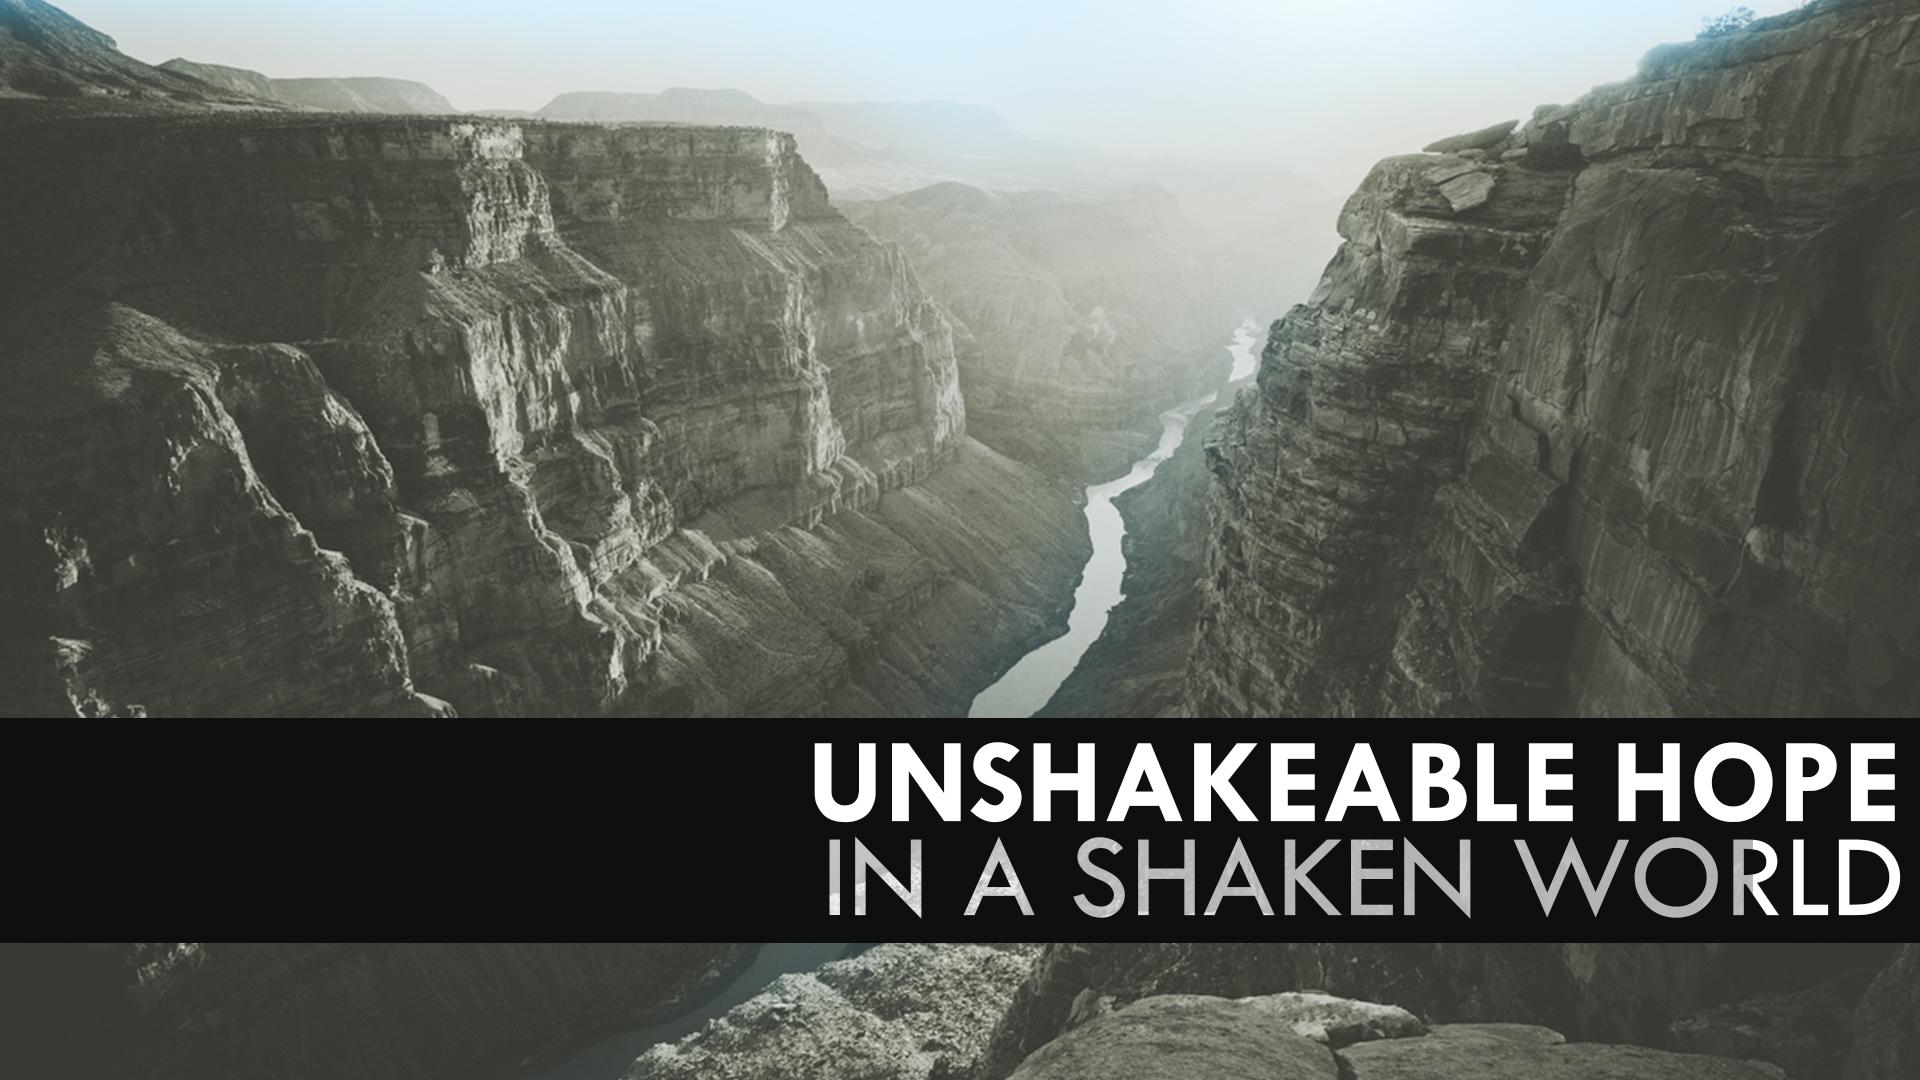 Unshakable Hope In A Shaken World